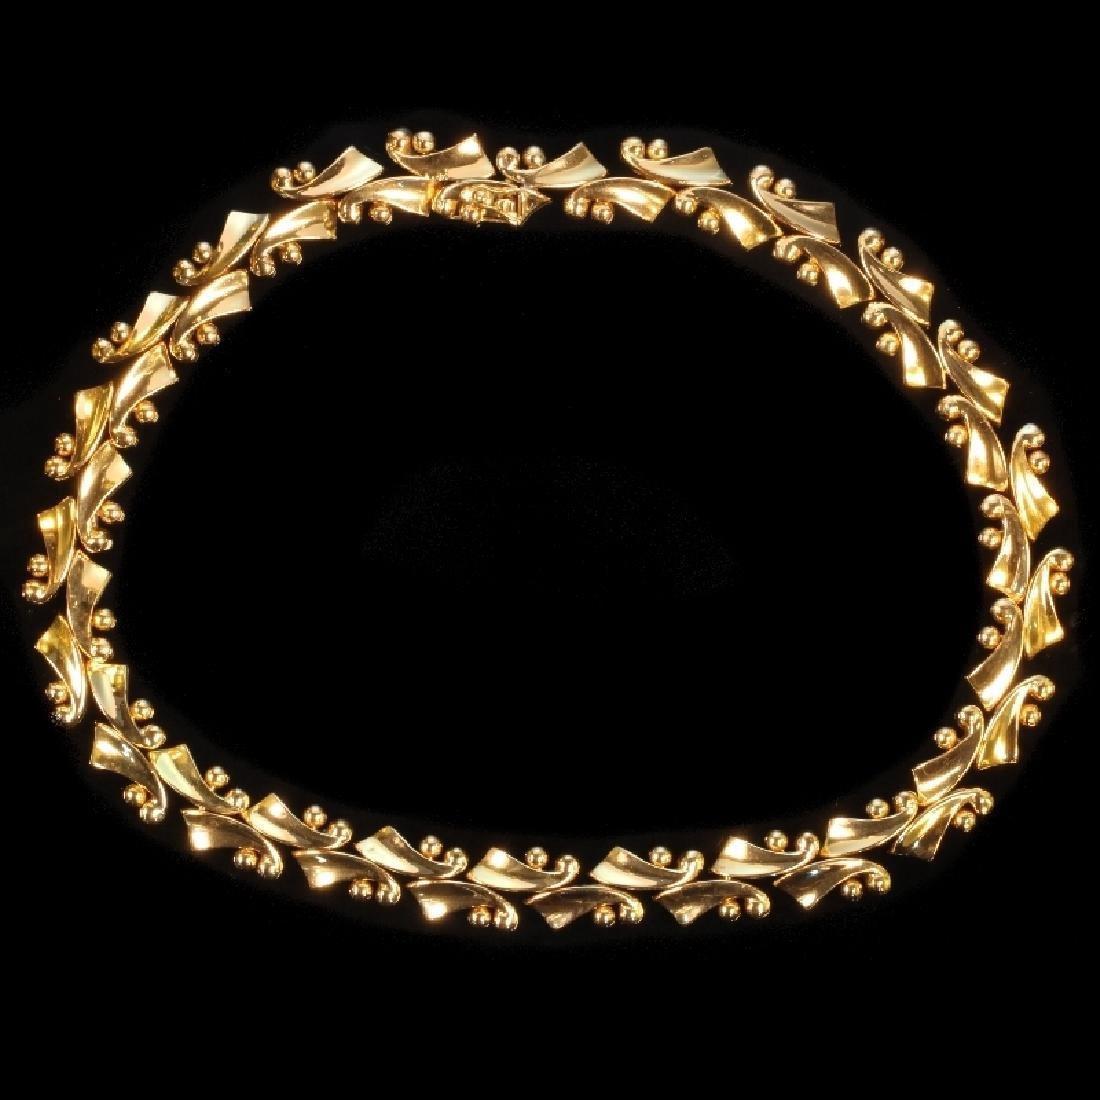 Vintage Retro 18K Yellow Gold Necklace, 1950